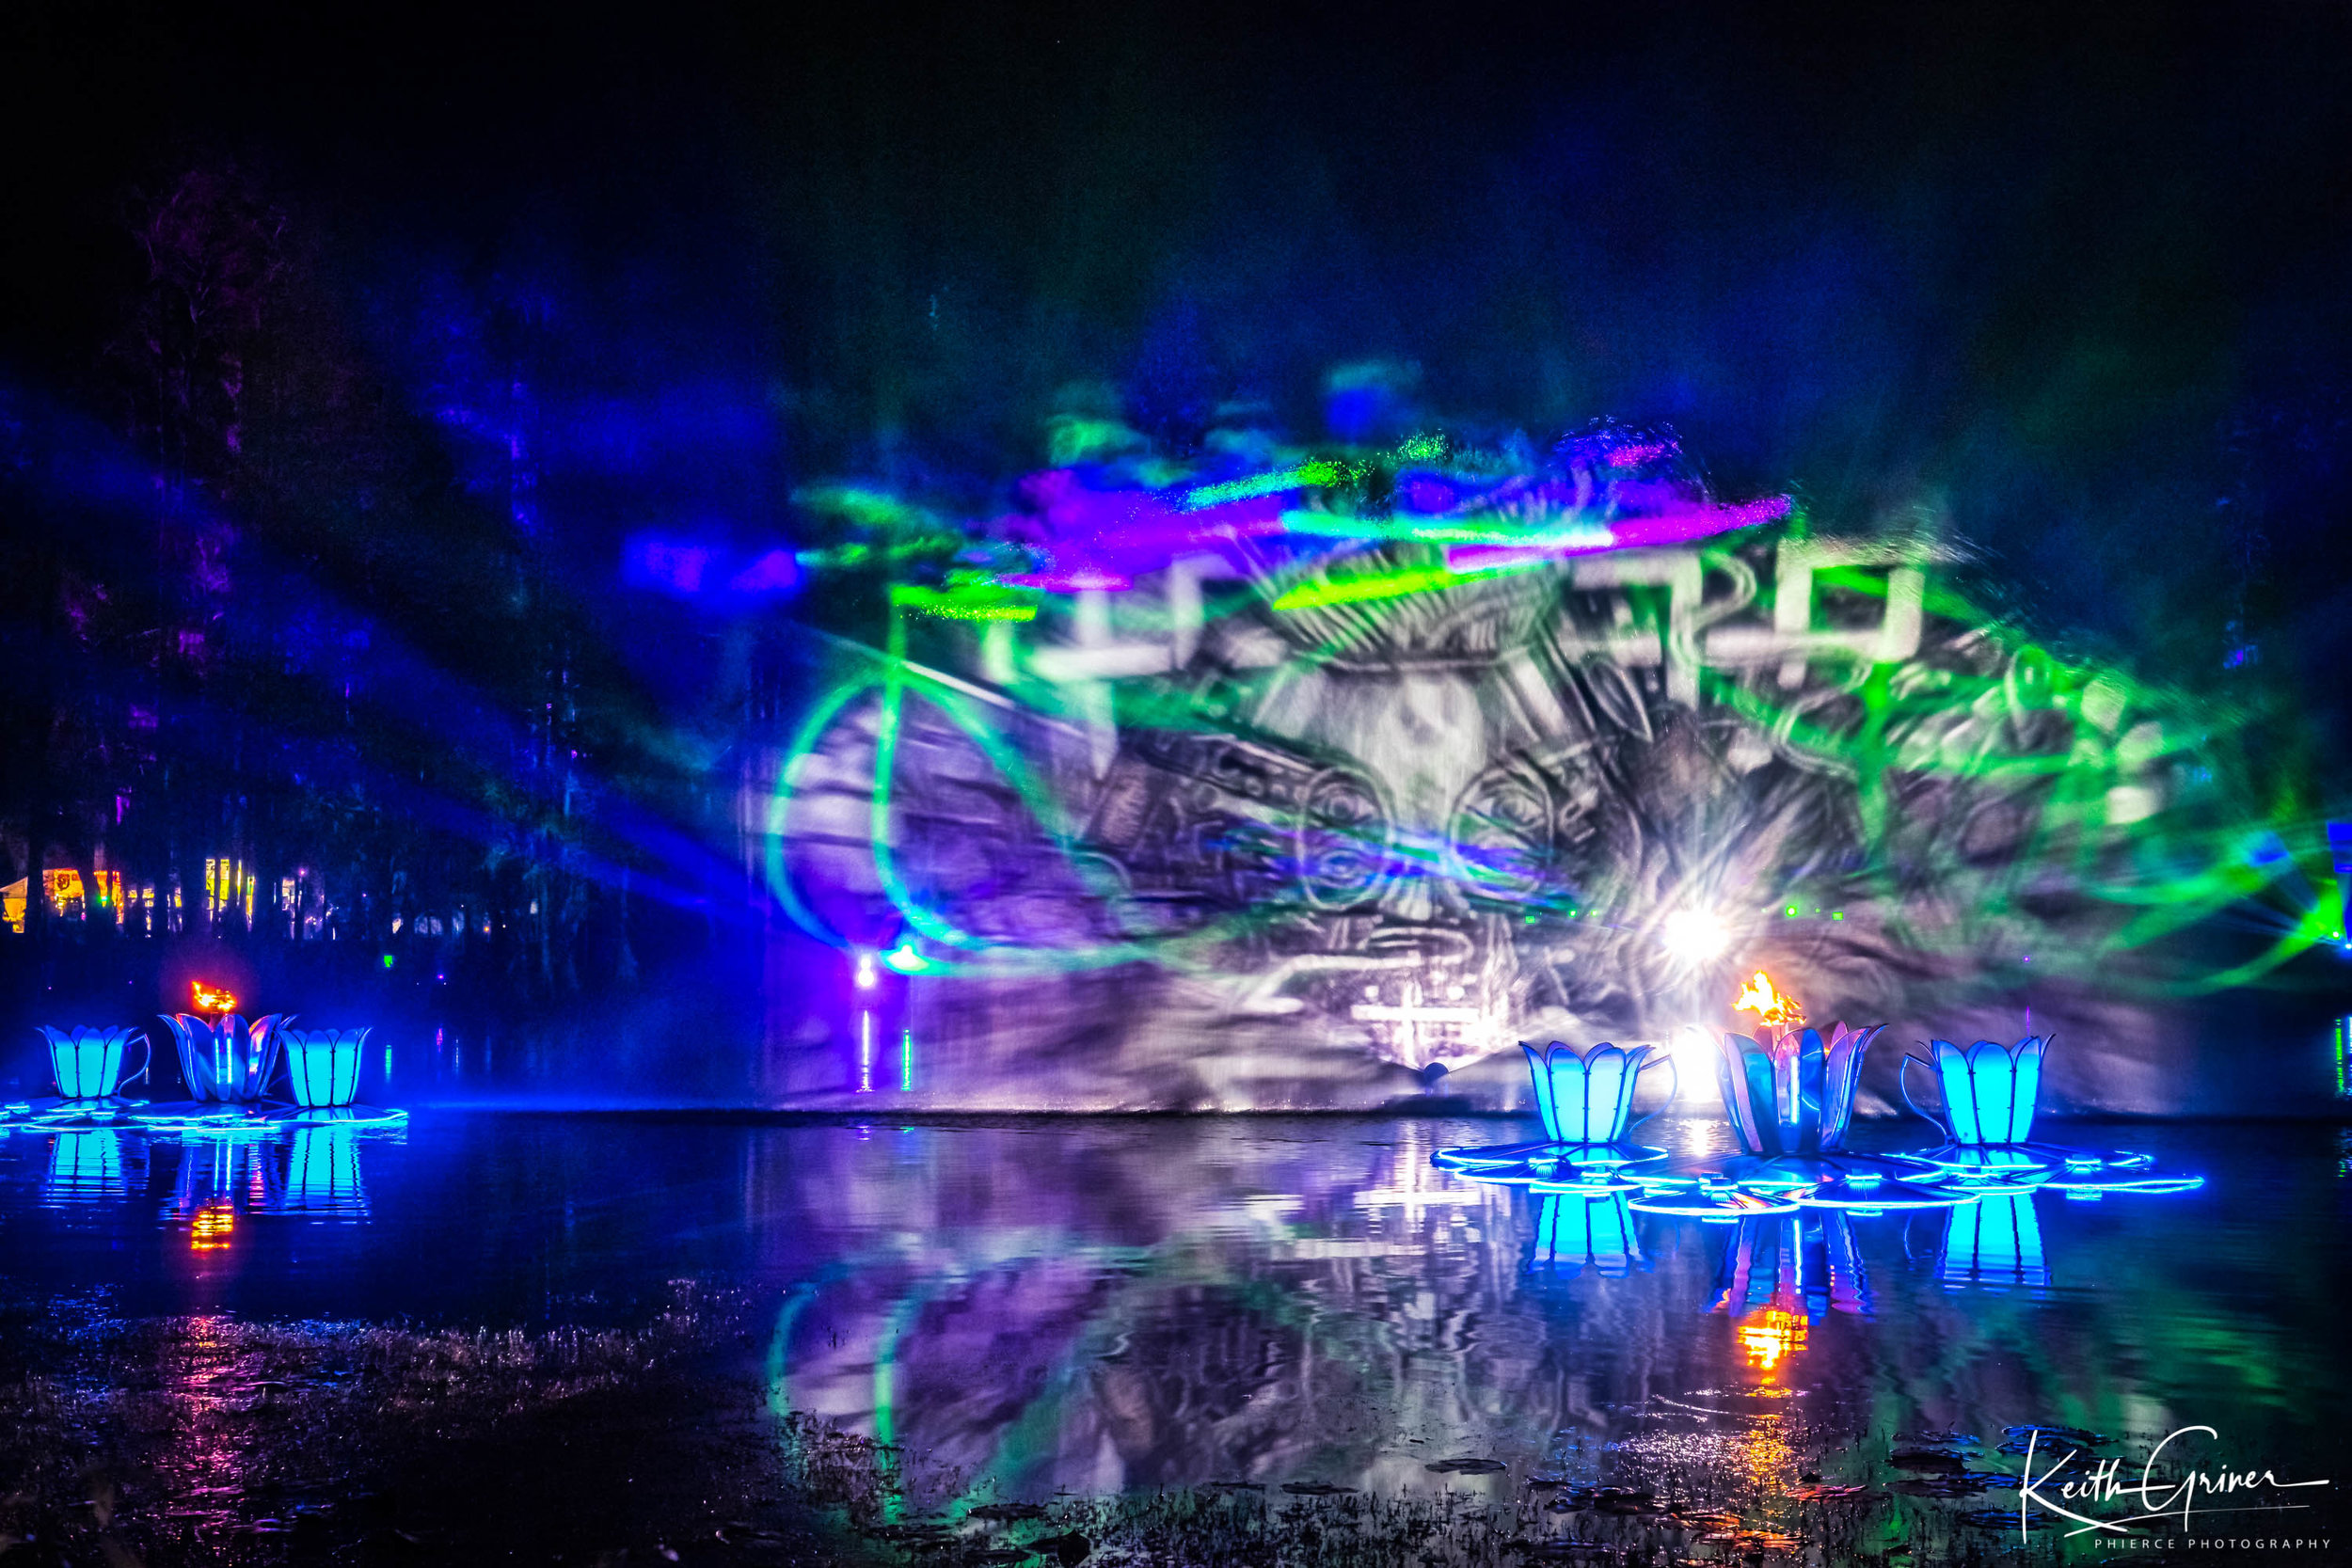 Hula_Spirit Lake_by Keith Griner 0D5_3271-Edit.jpg